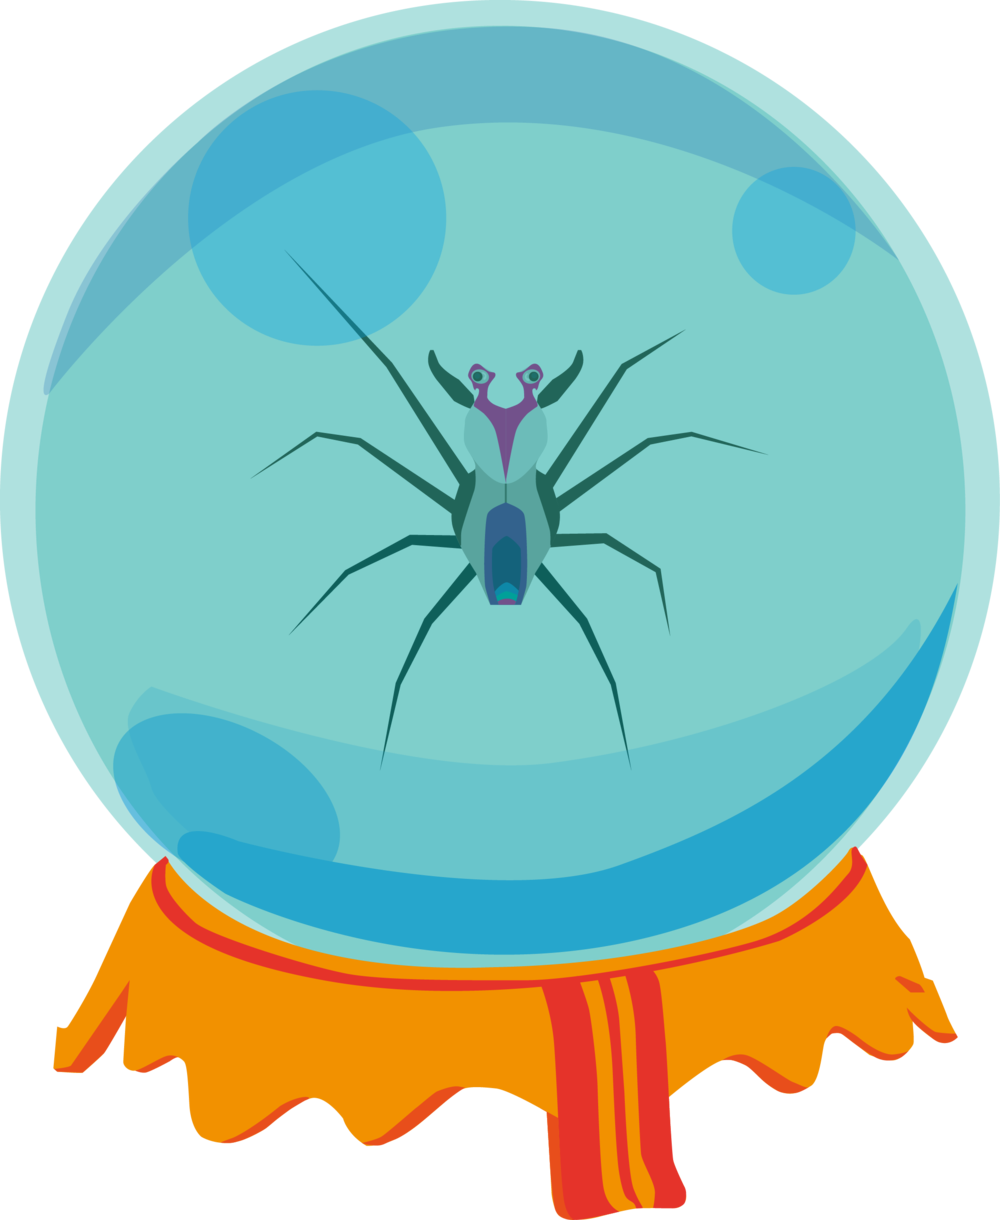 水晶球.png